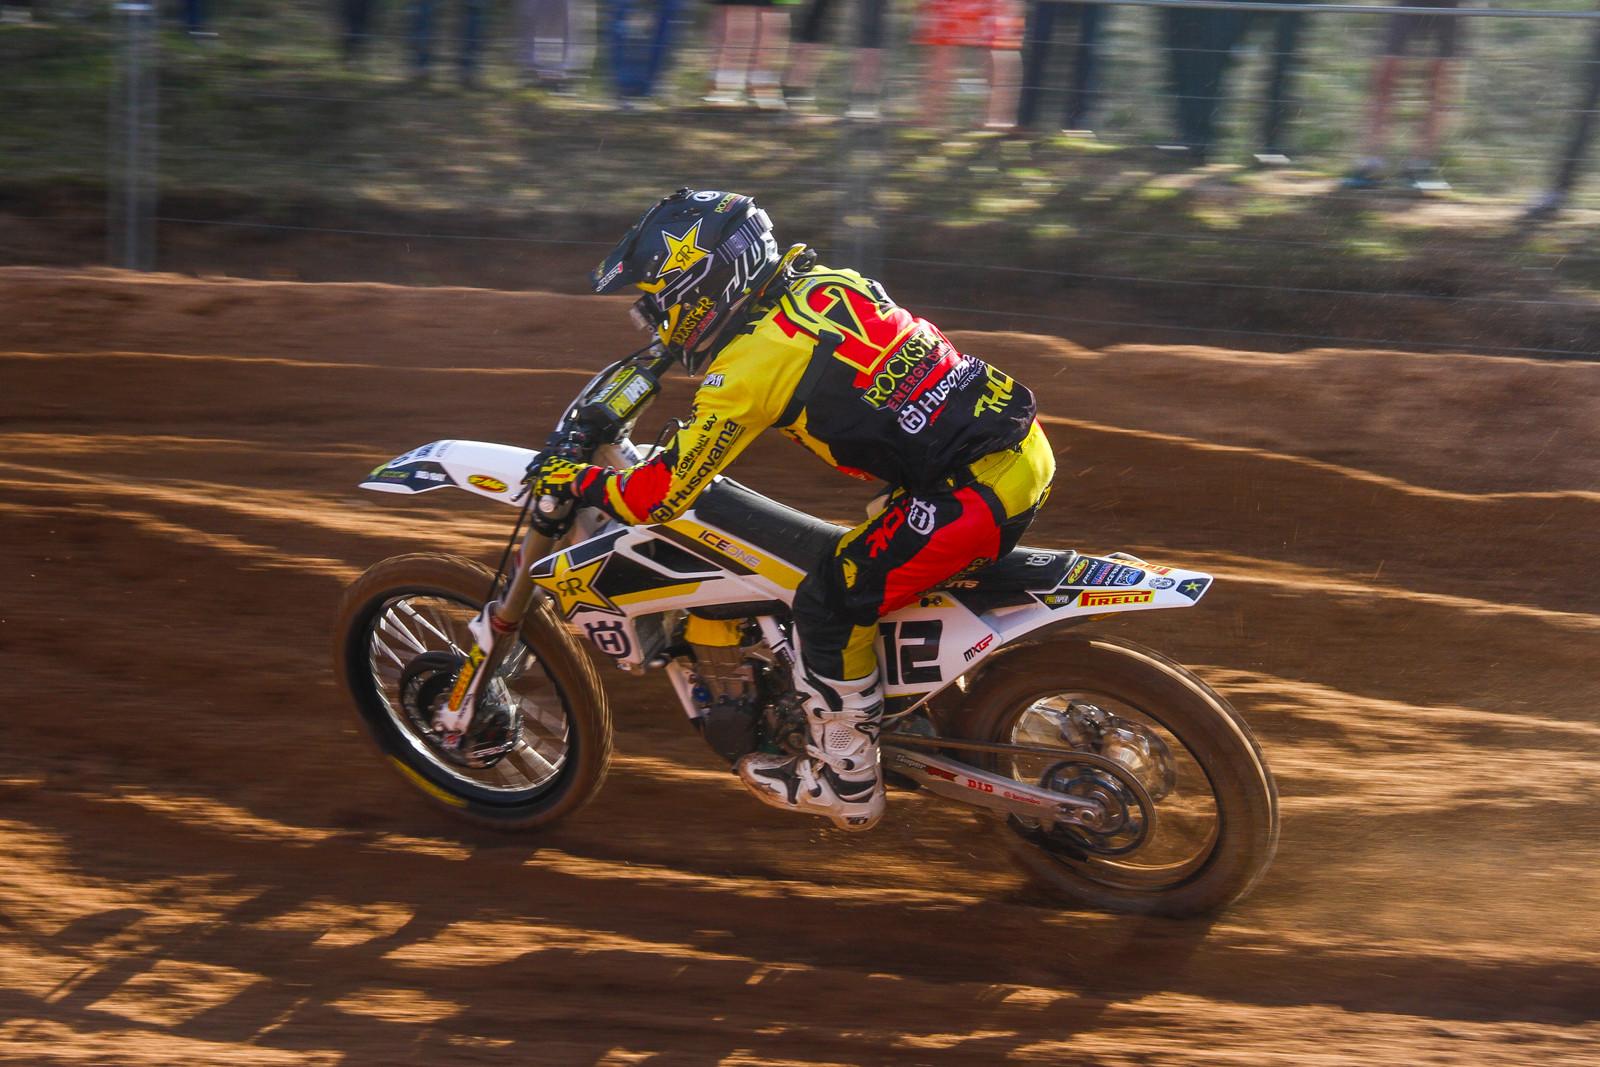 Max Nagl - Photo Blast: 2017 MXGP of Latvia - Motocross Pictures - Vital MX